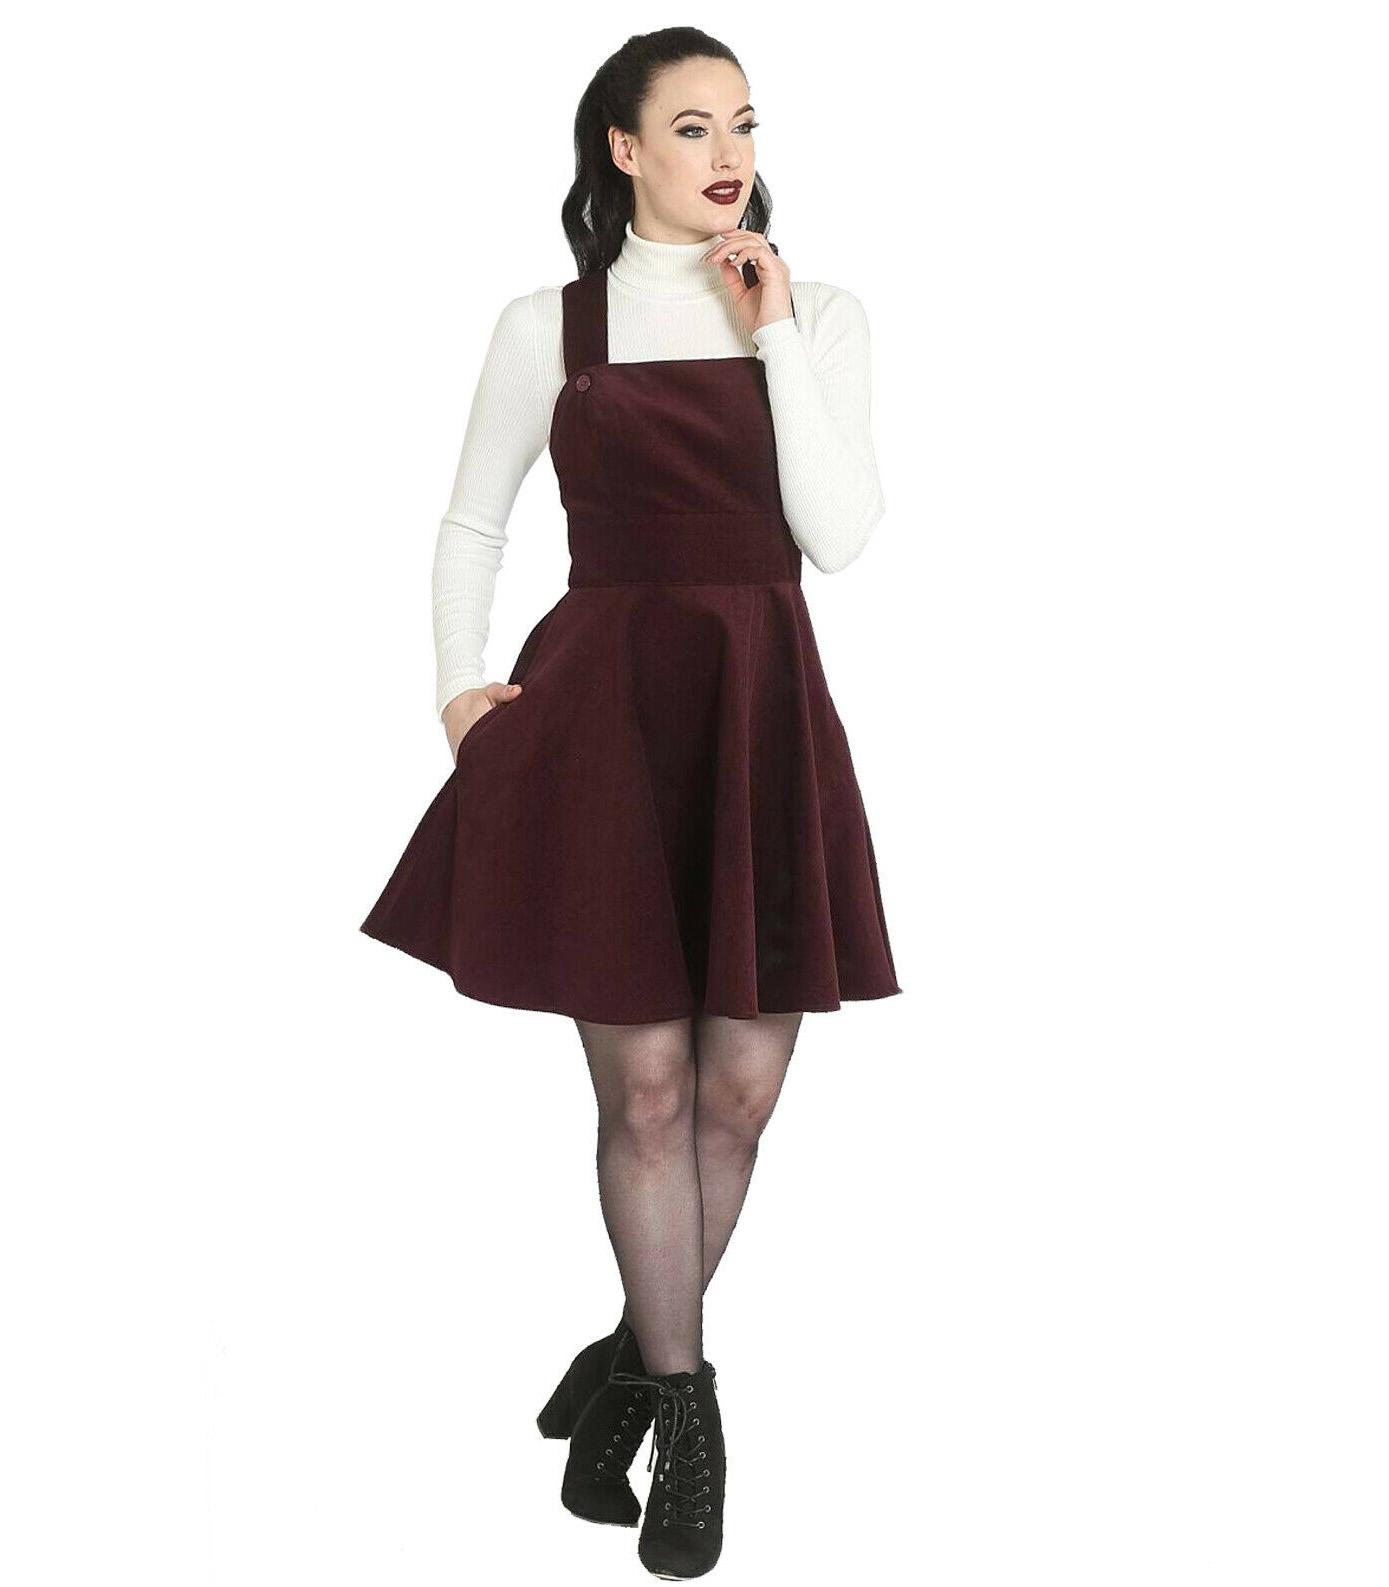 Hell-Bunny-Rockabilly-Corduroy-Mini-Dress-WONDER-YEARS-Pinafore-Wine-All-Sizes thumbnail 31